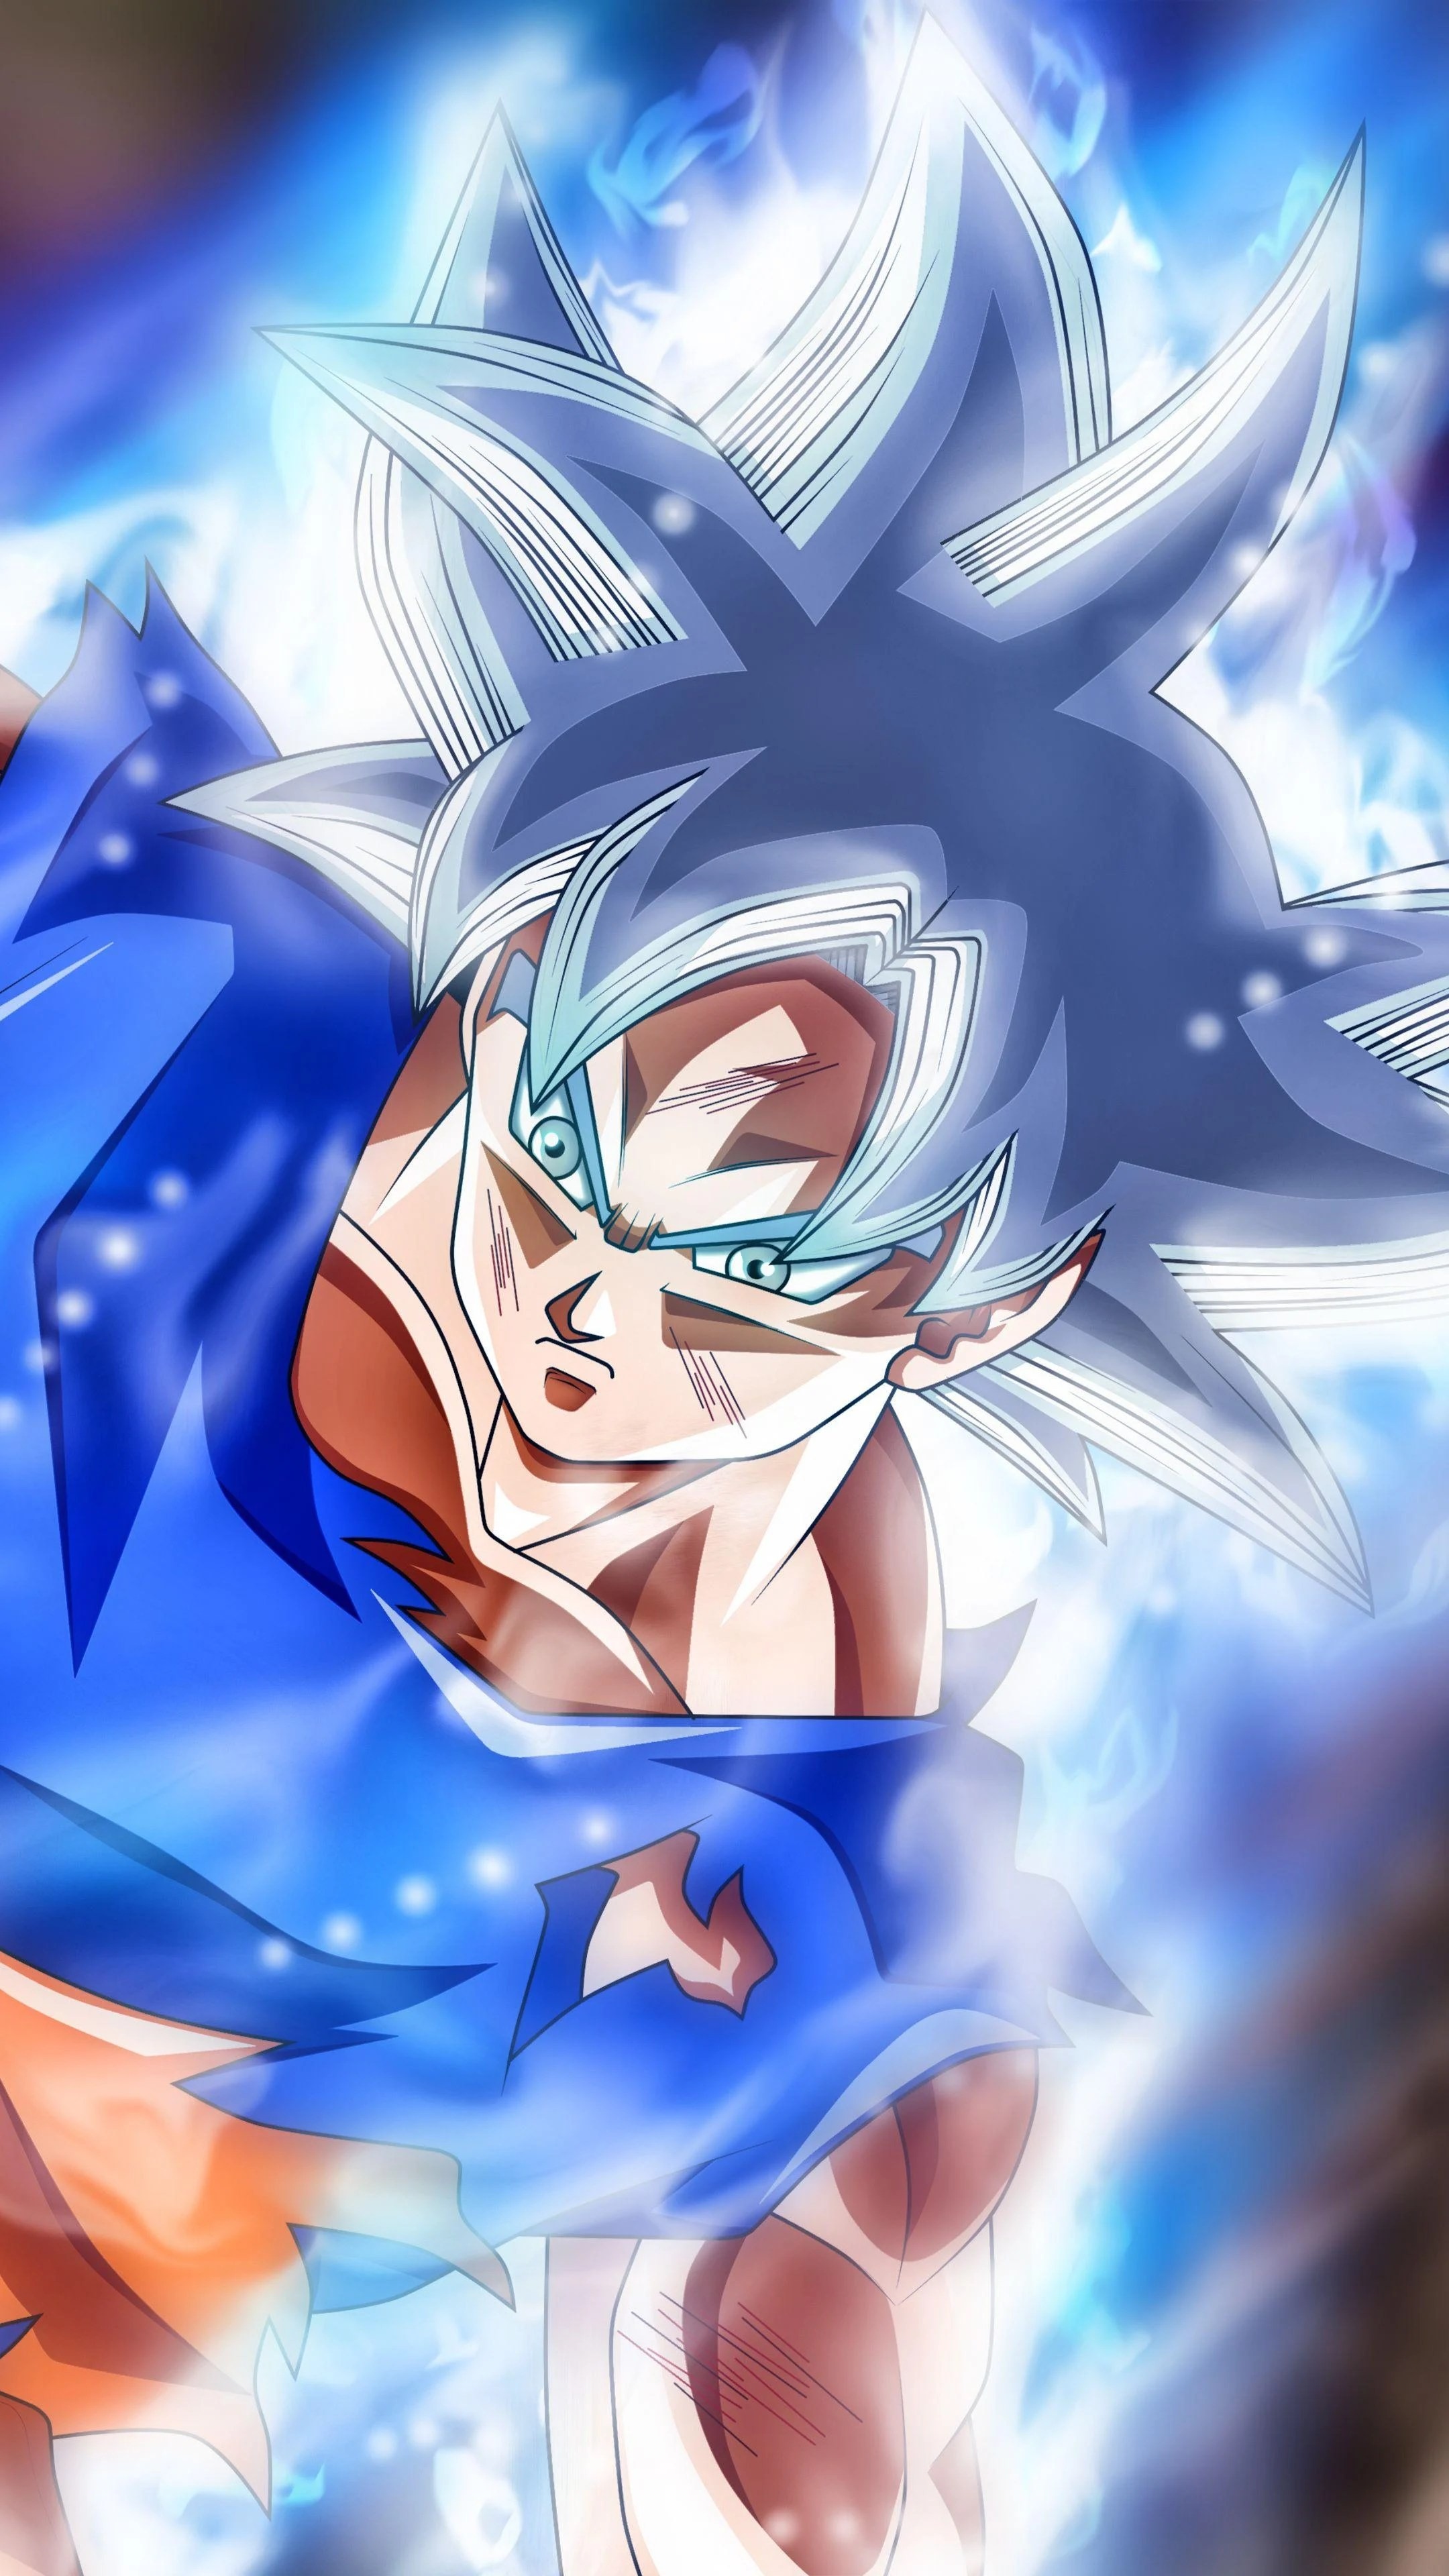 Super Saiyan Live Wallpaper Iphone X Goku Master Ultra Instinct Wallpapers Wallpaper Cave